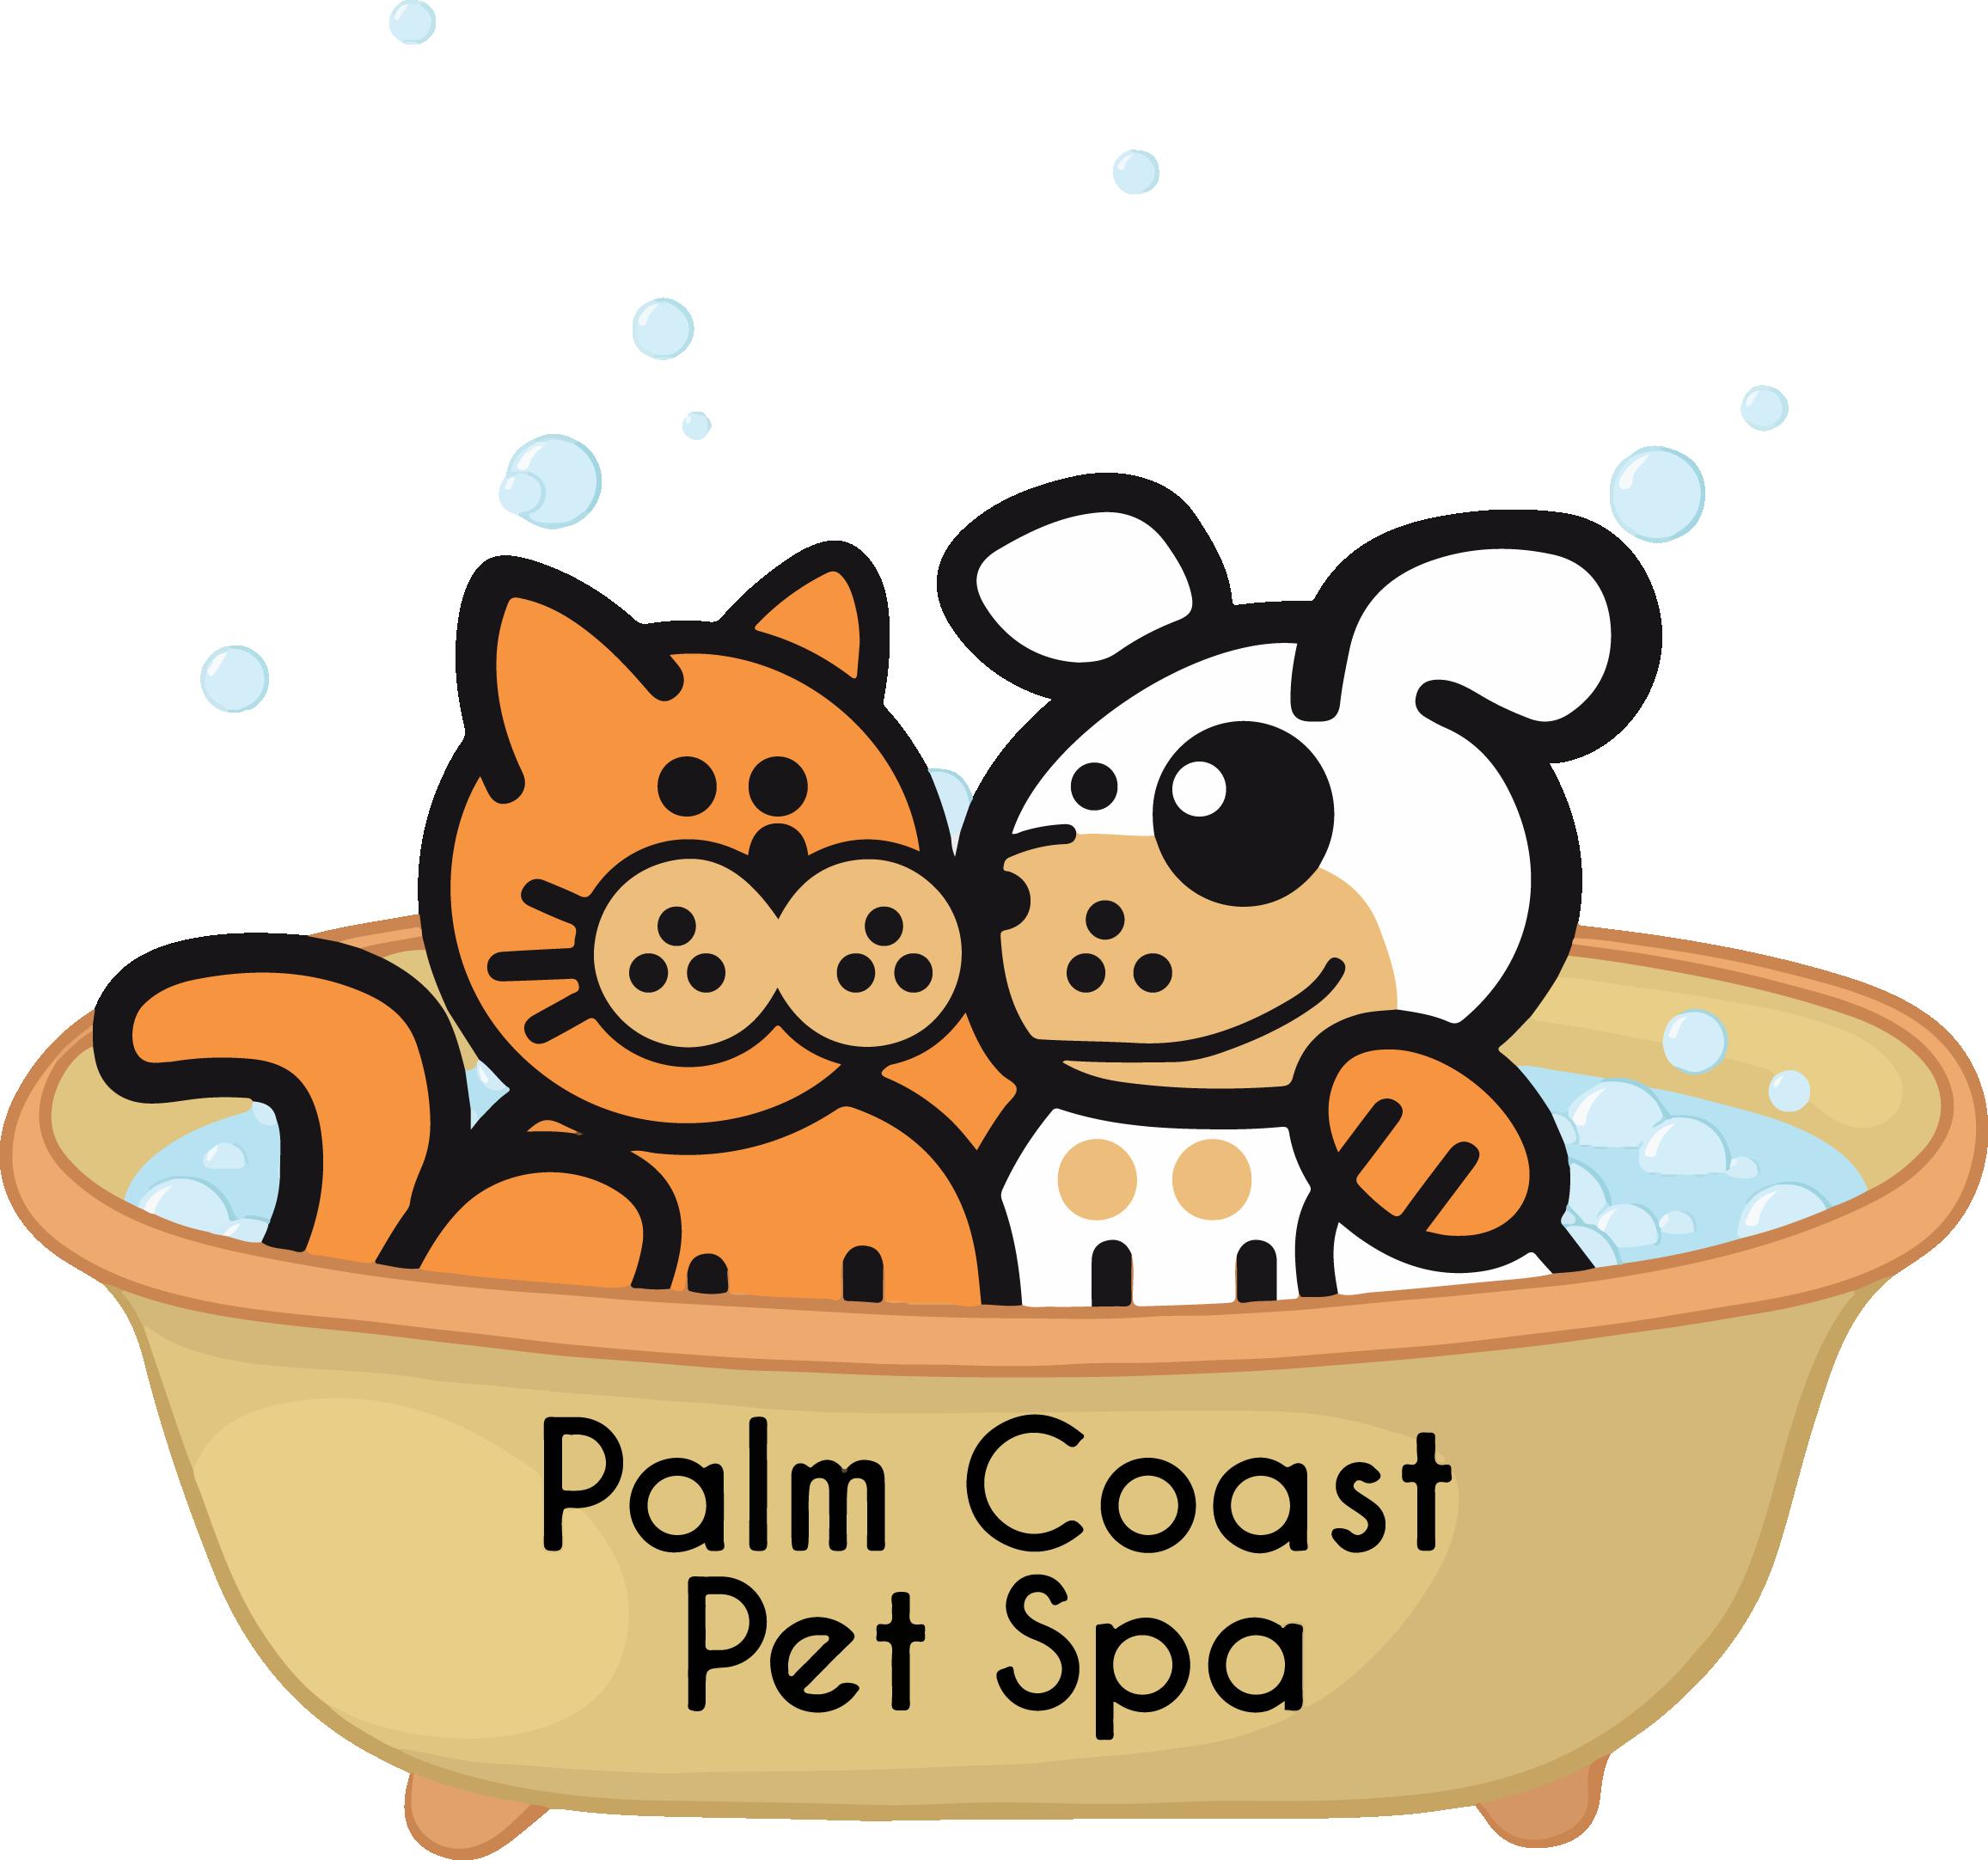 Dog and cat bath clipart. Palm coast pet spa